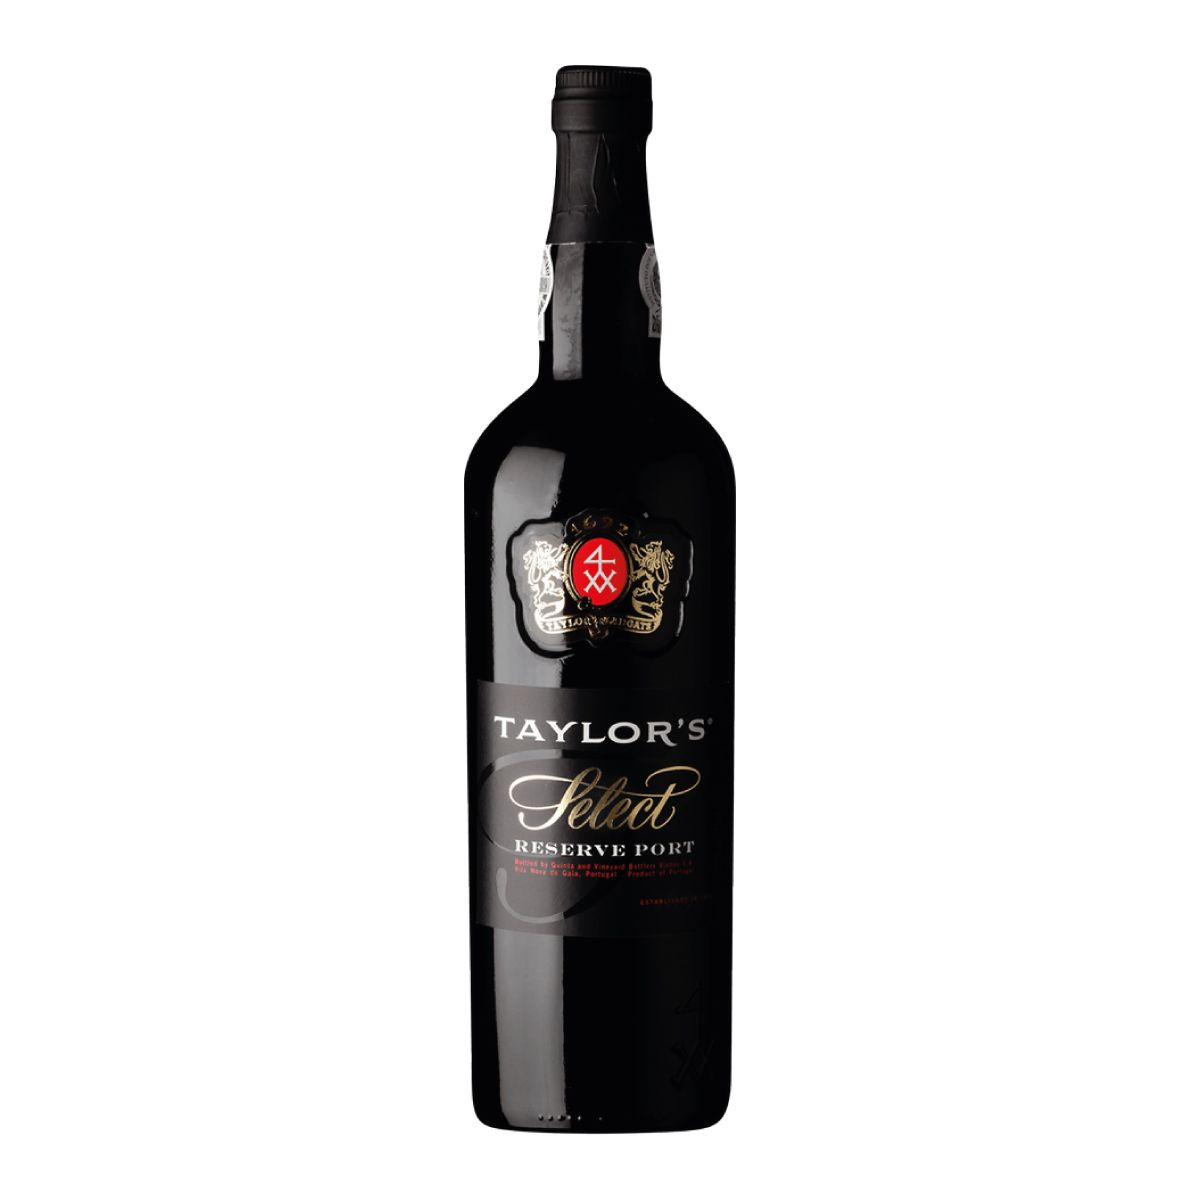 Vinho do Porto Taylor's Ruby Select Reserve